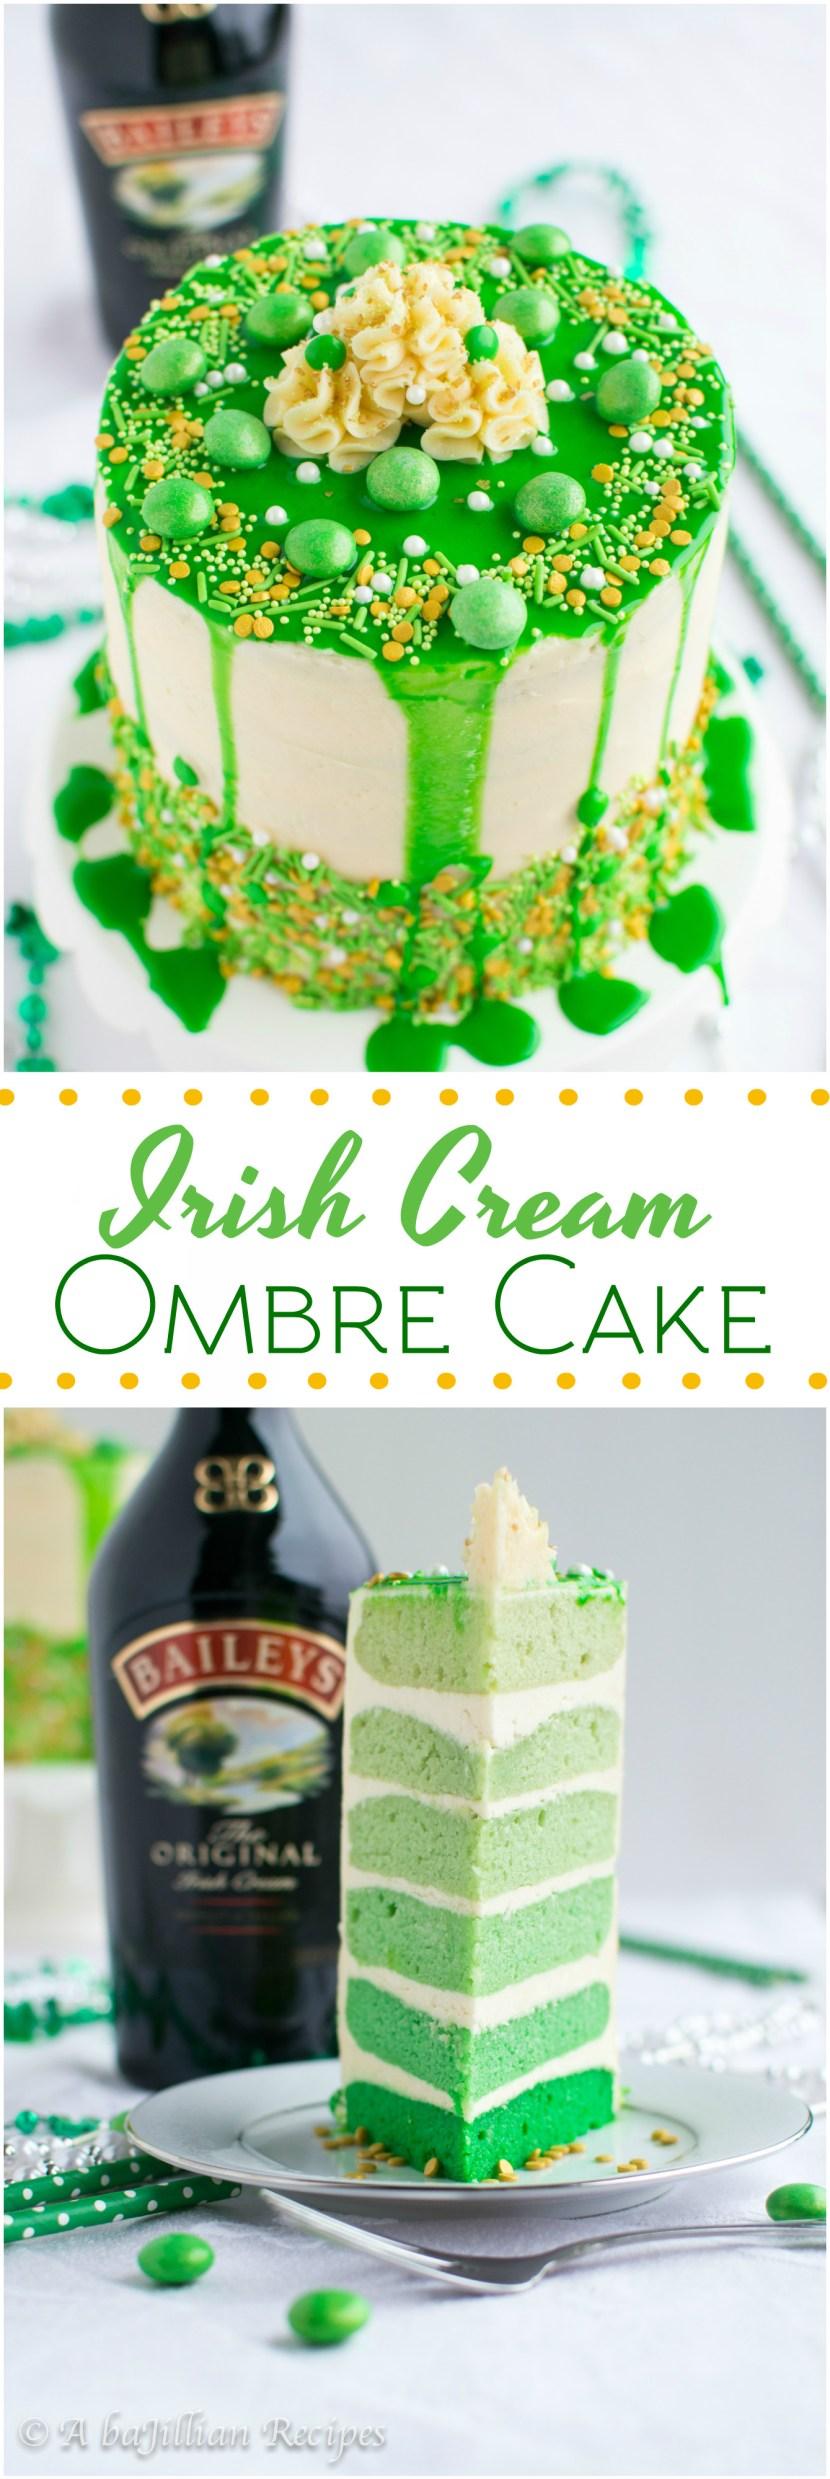 Swell Irish Cream Ombre Cake A Bajillian Recipes Personalised Birthday Cards Veneteletsinfo